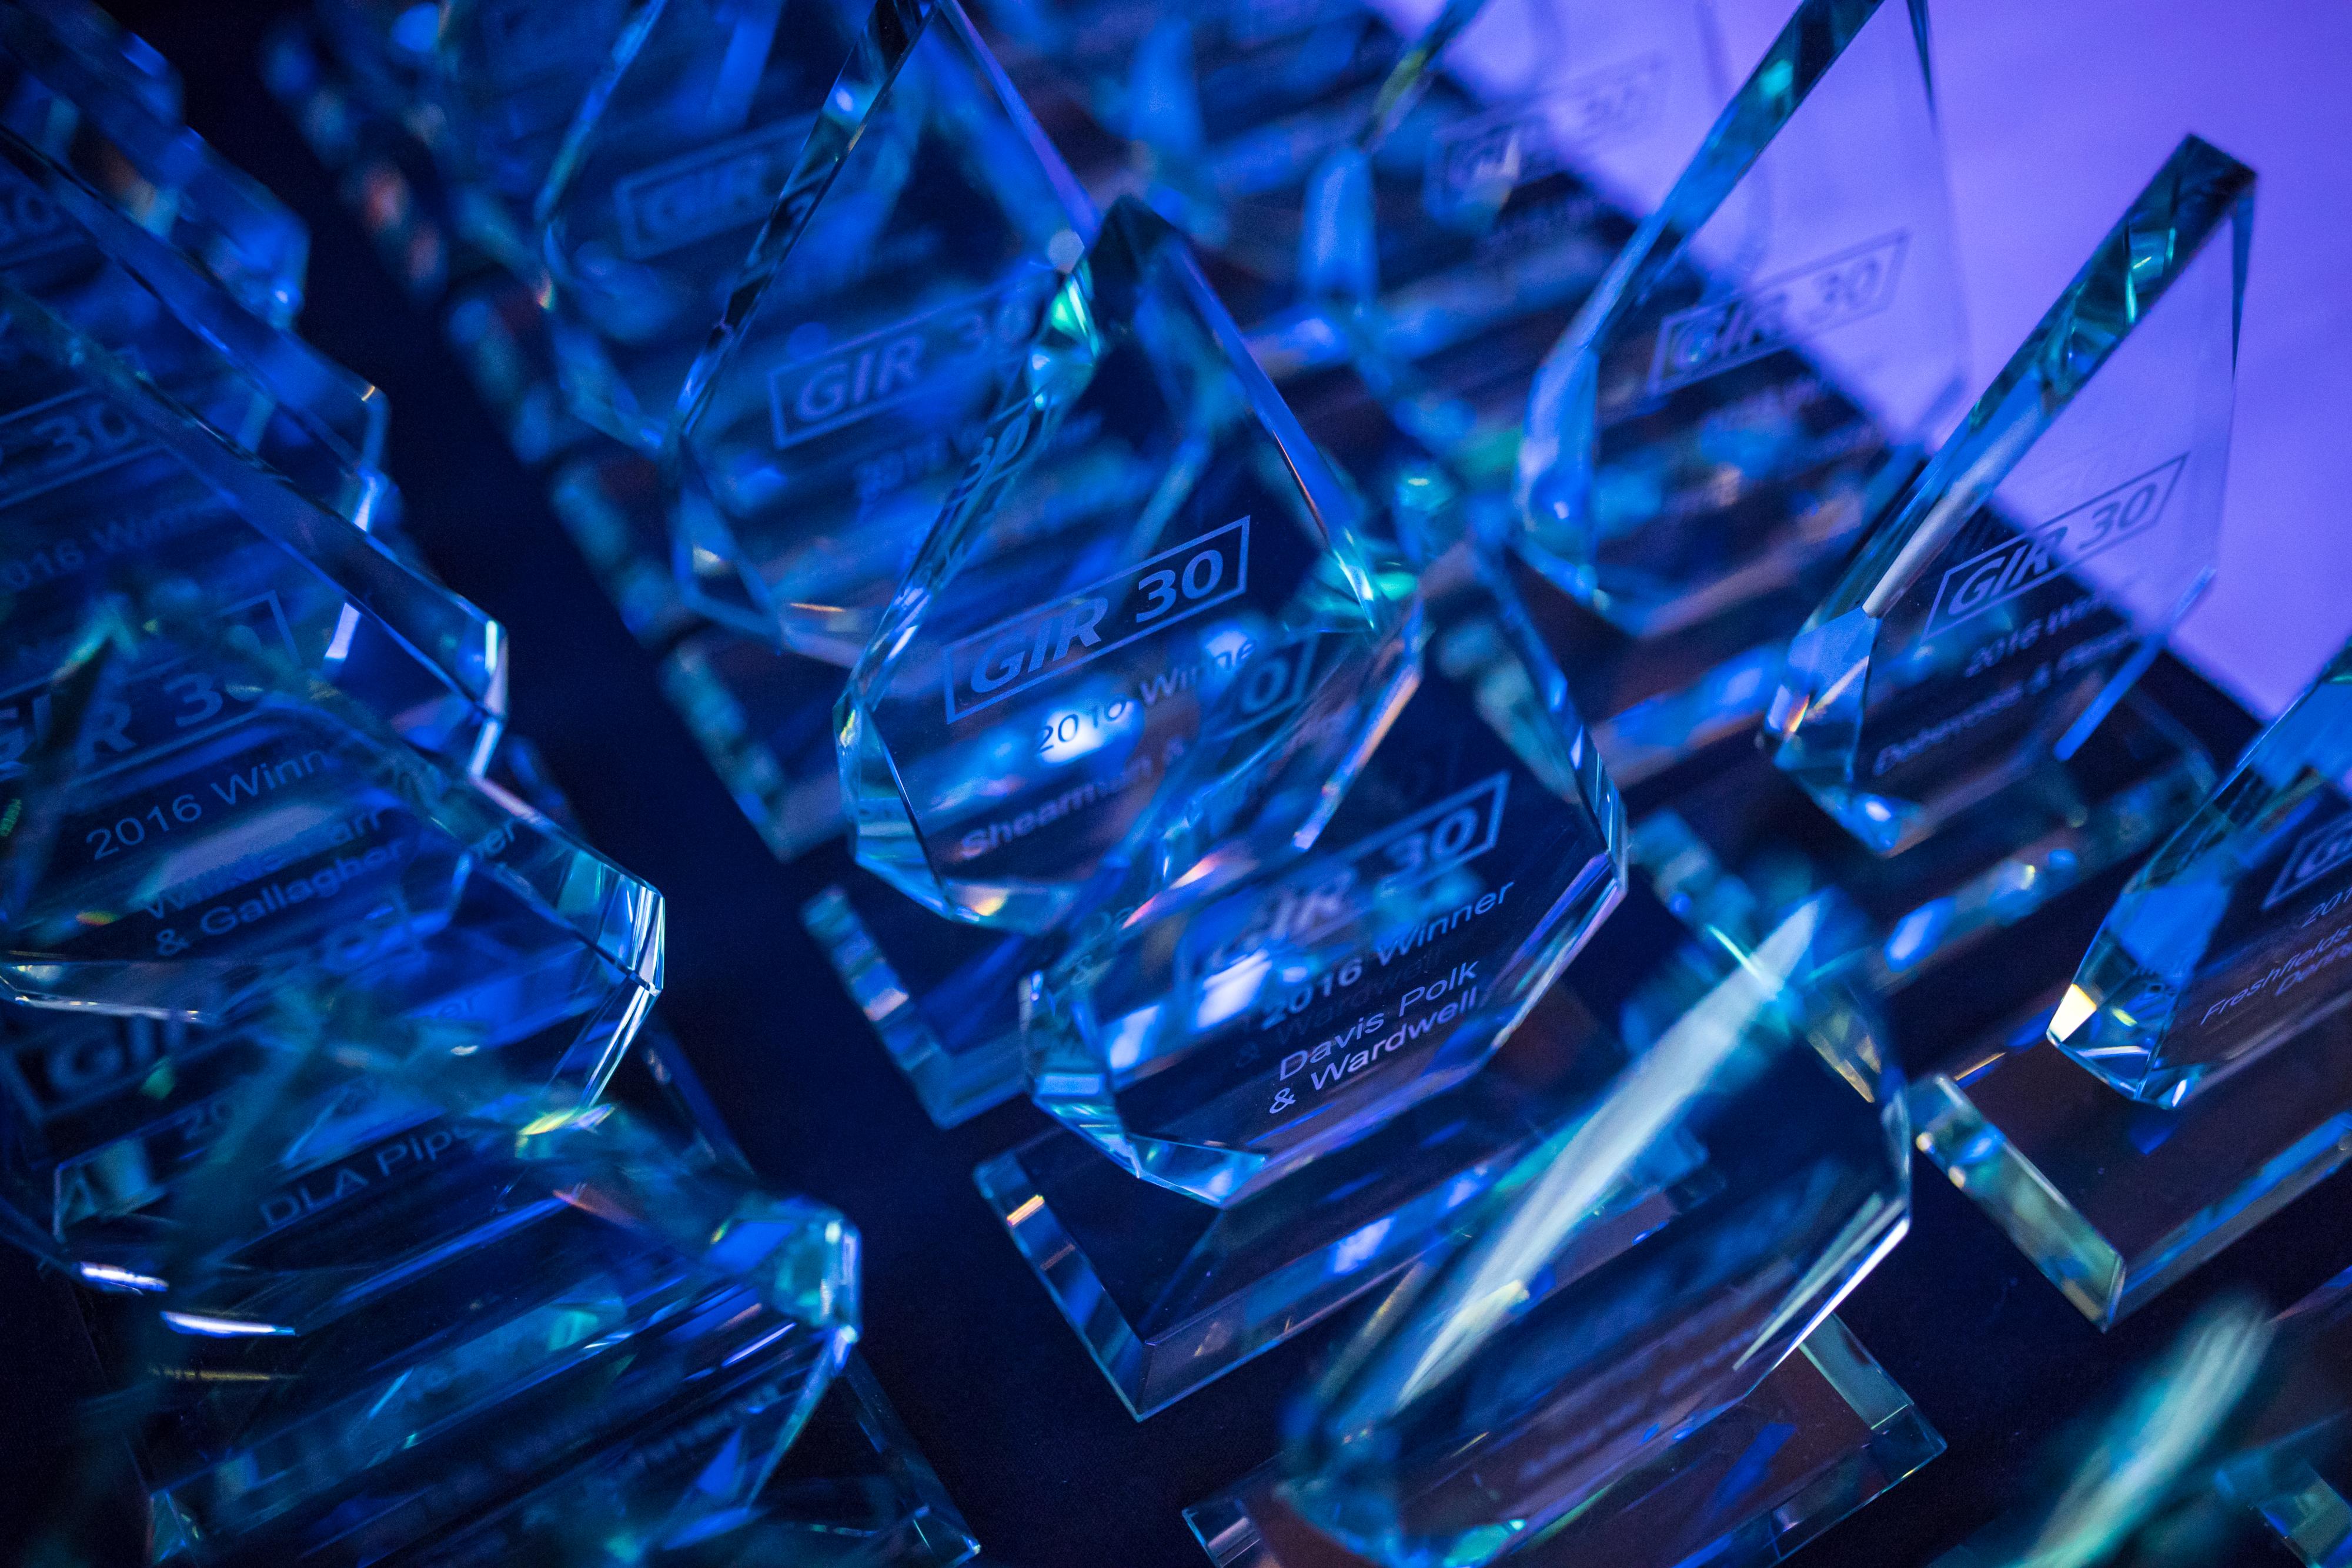 GIR Awards 2017 – The Winners